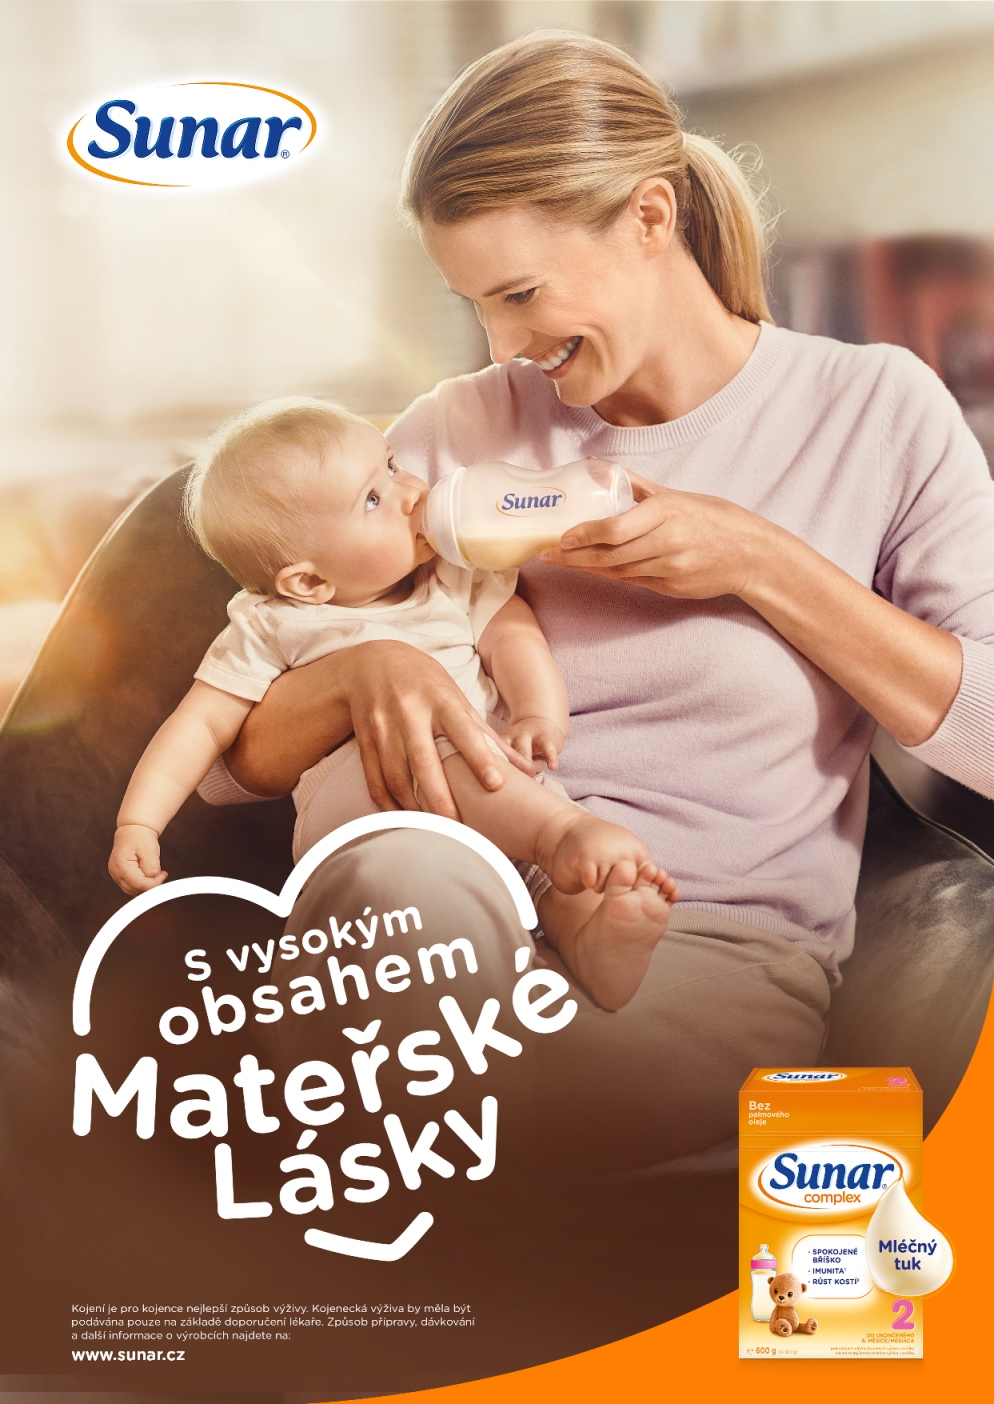 Sunar: S vysokým obsahem mateřské lásky (Saatchi & Saatchi)